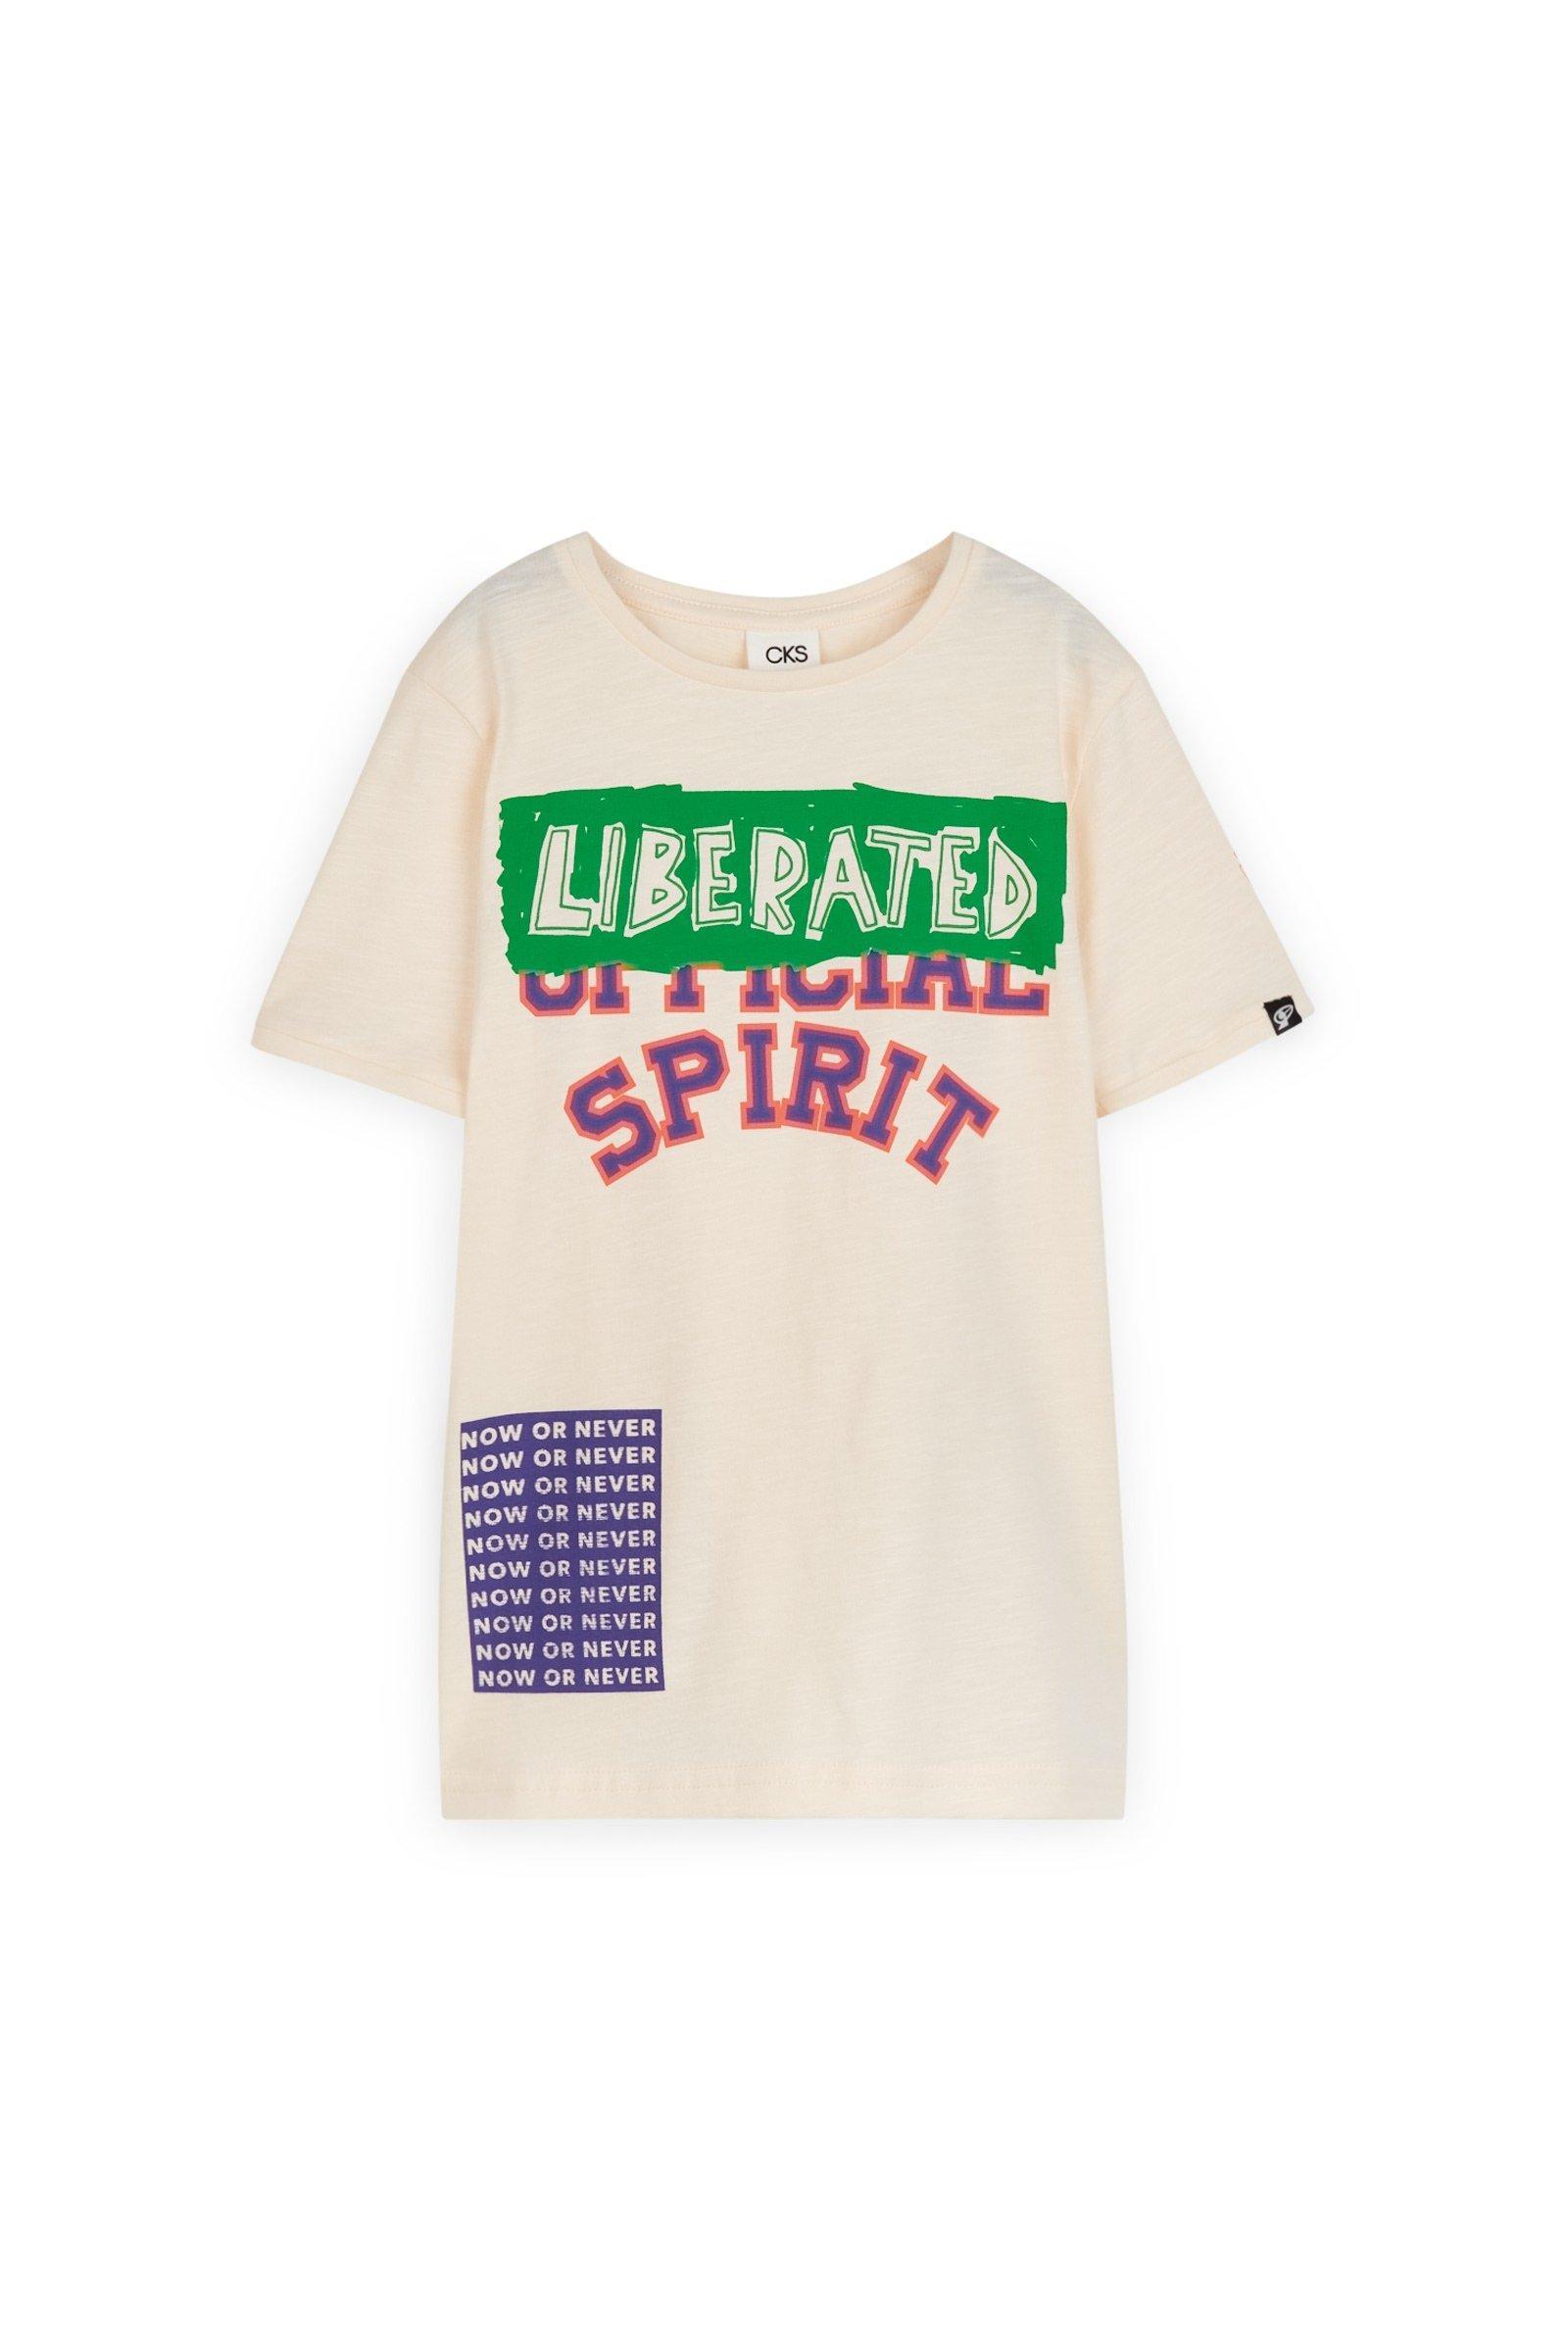 CKS Kids - YEDGAR - t-shirt korte mouwen - wit